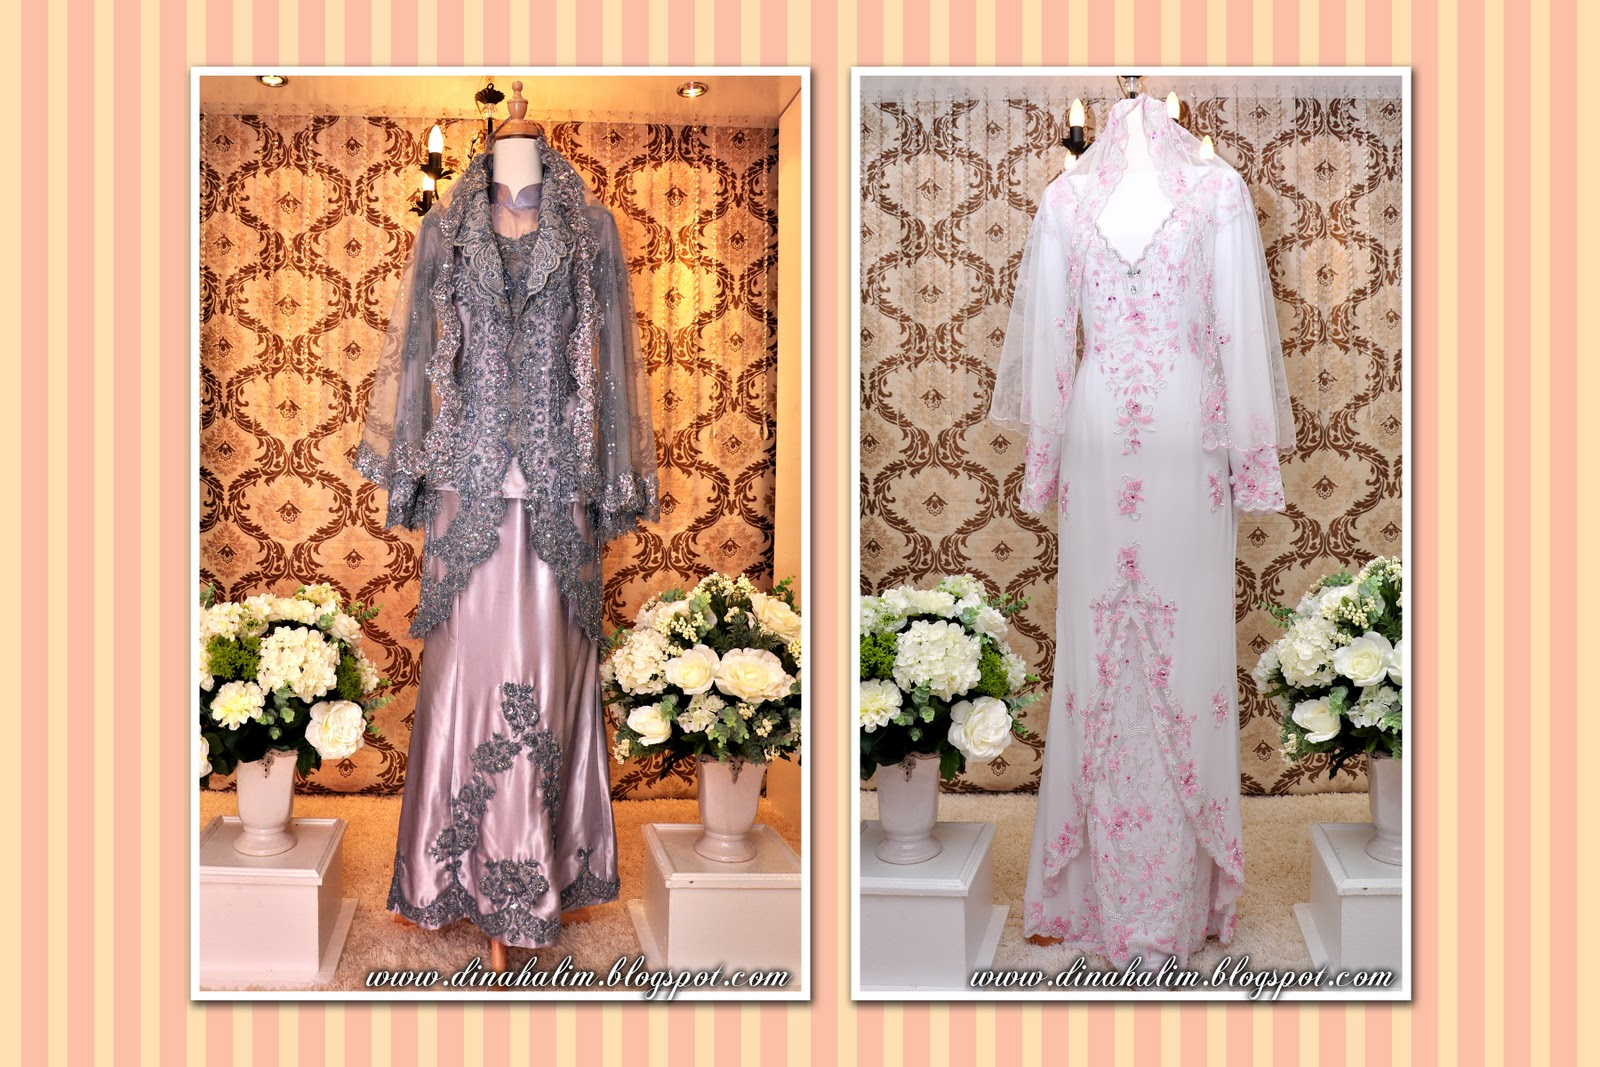 Baju Sanding Eksklusif Grey manik Silver & Baju Jojet Silk Putih manik ...